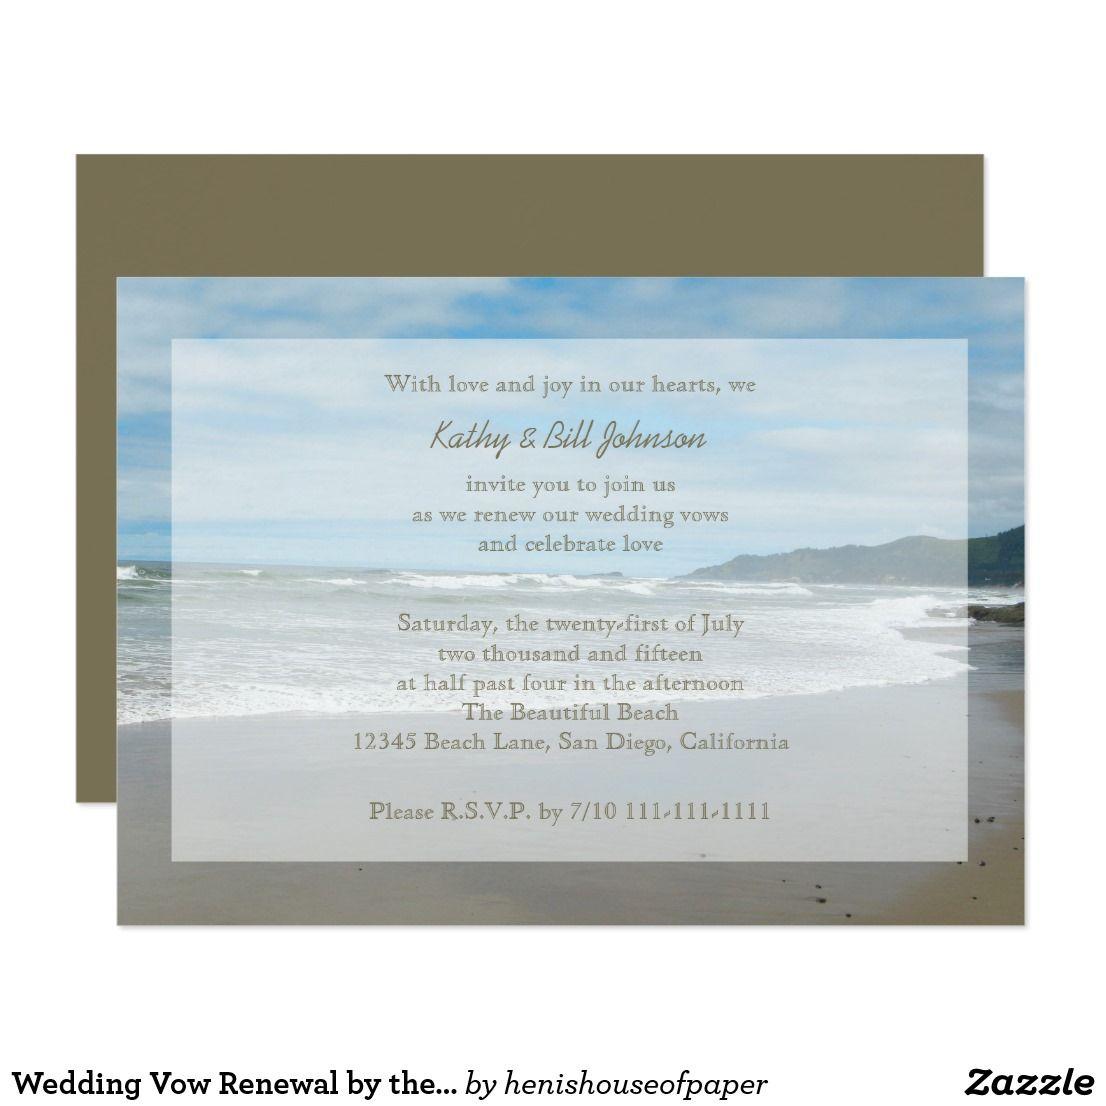 Matt damon and luciana barroso renew vows in sugar beach beach matt damon and luciana barroso renew vows in sugar beach beach wedding vow renewals and 25 wedding anniversary fandeluxe PDF